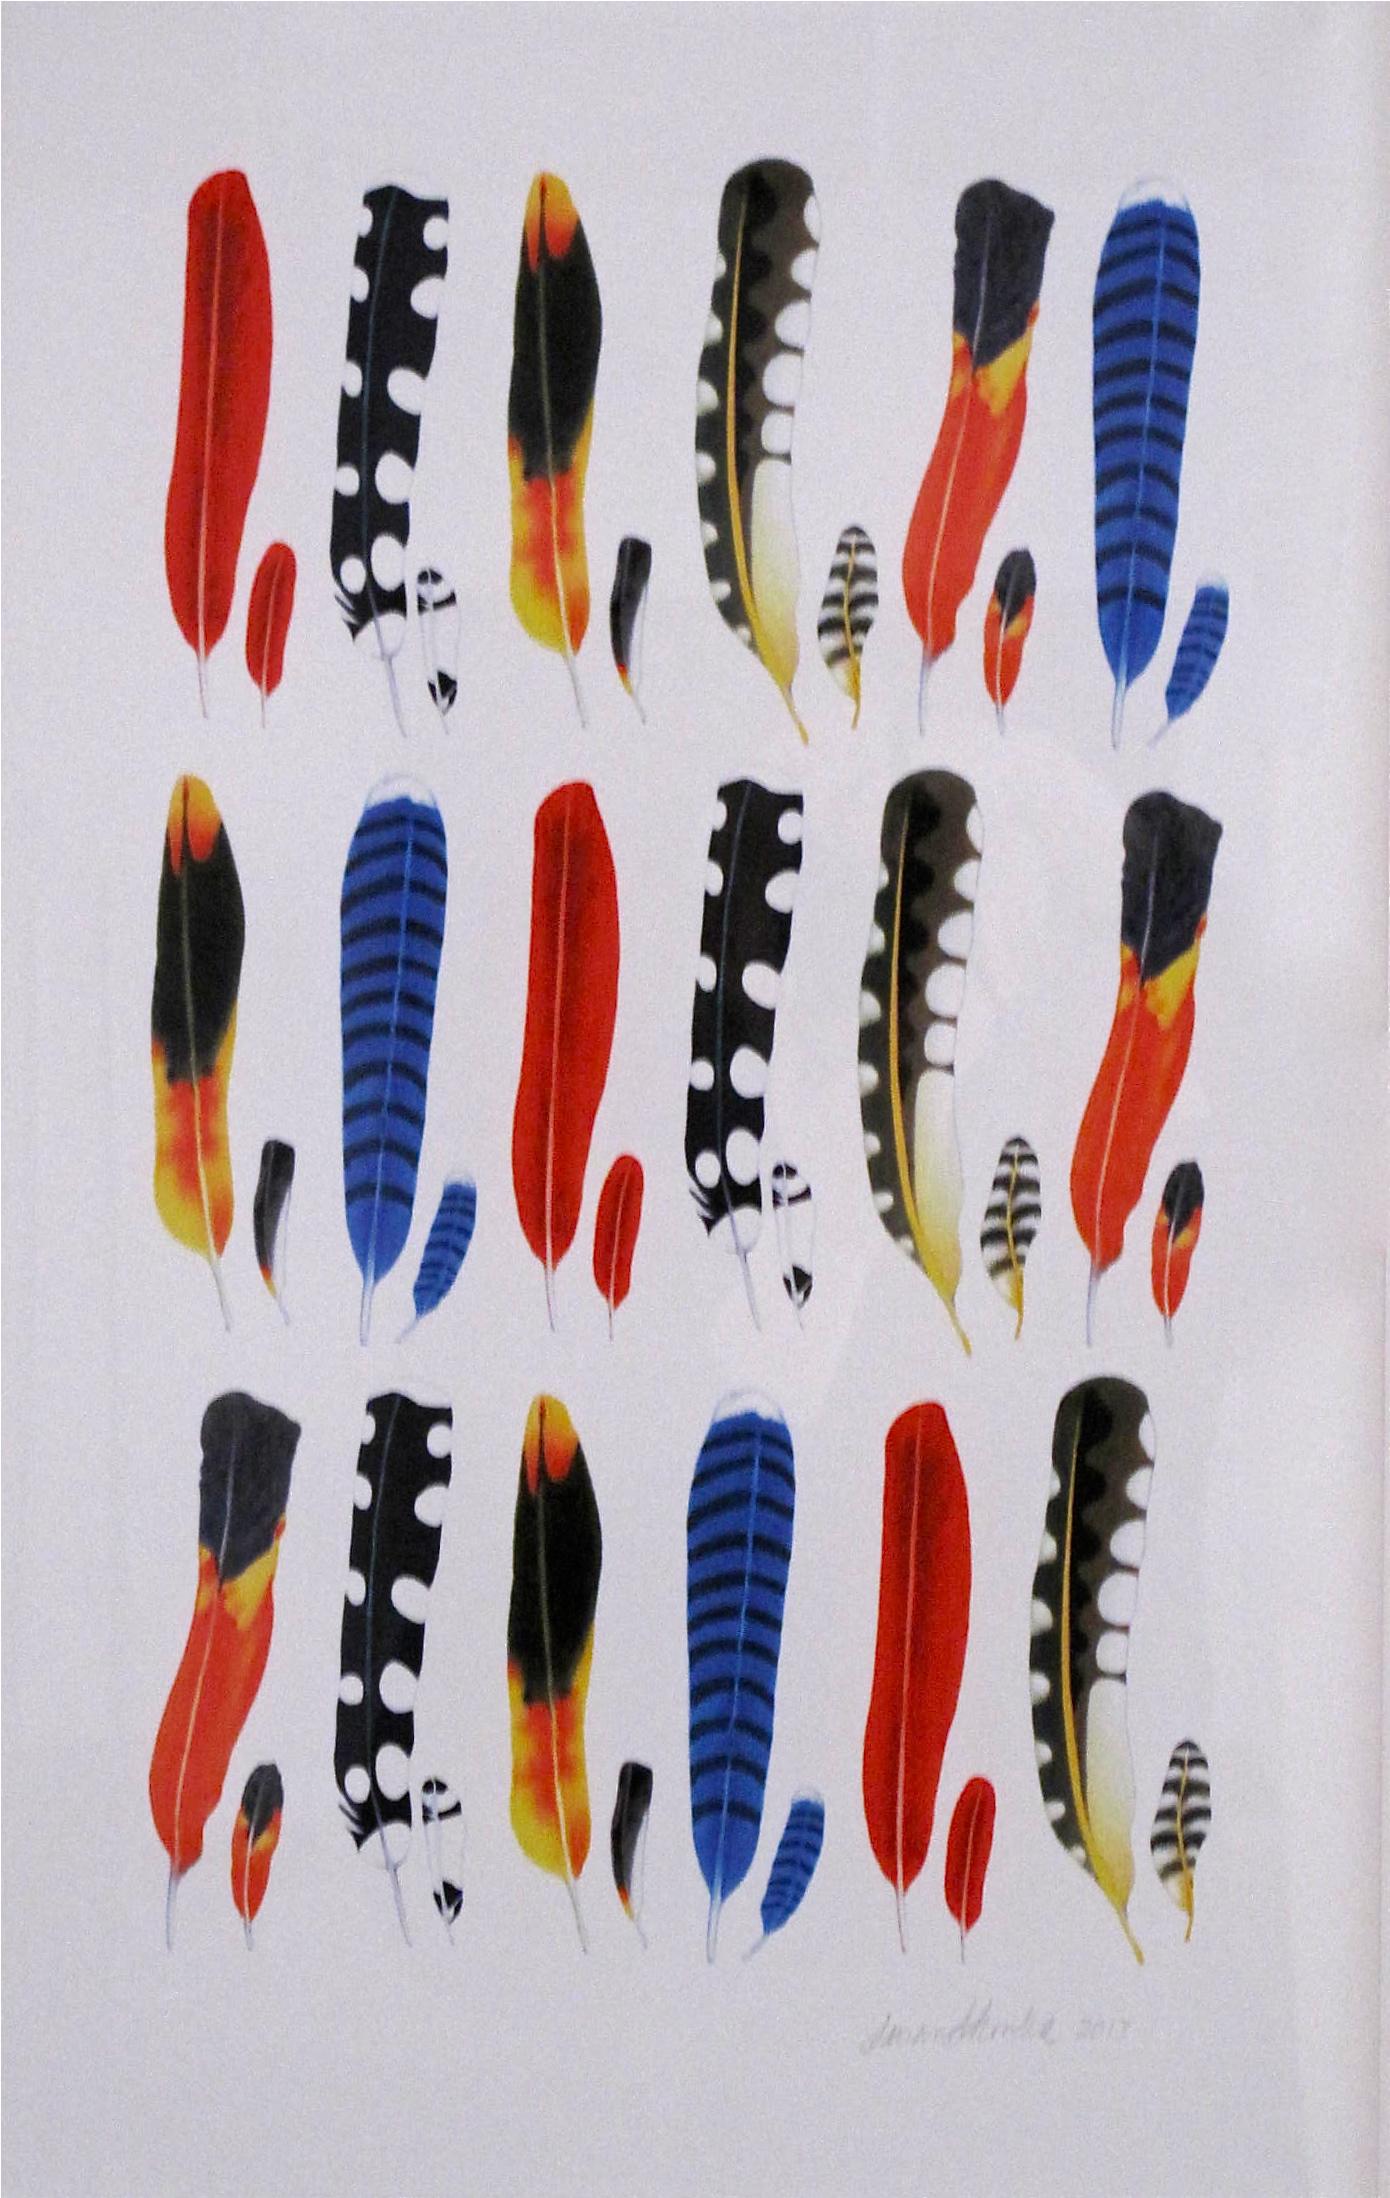 Susan Skoorka, Birds of a Feather